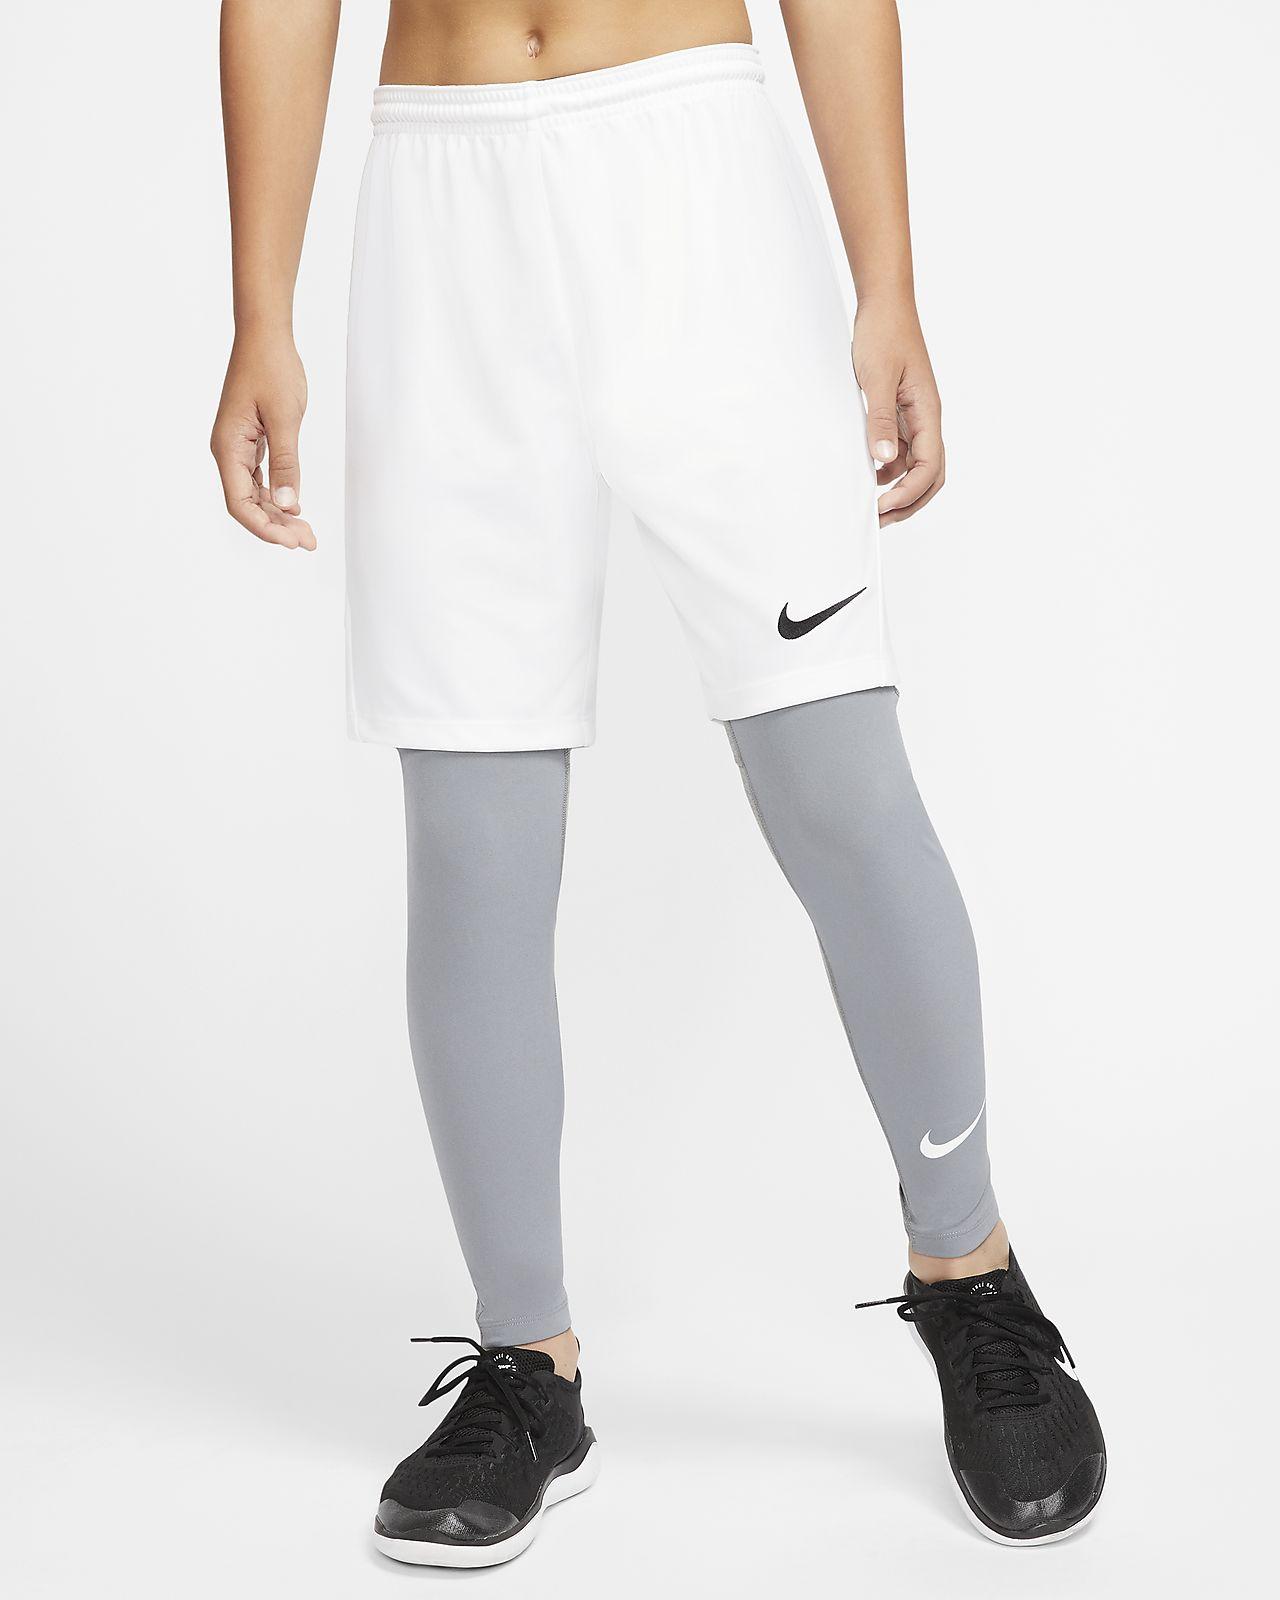 Nike Pro Big Kids' (Boys') Tights